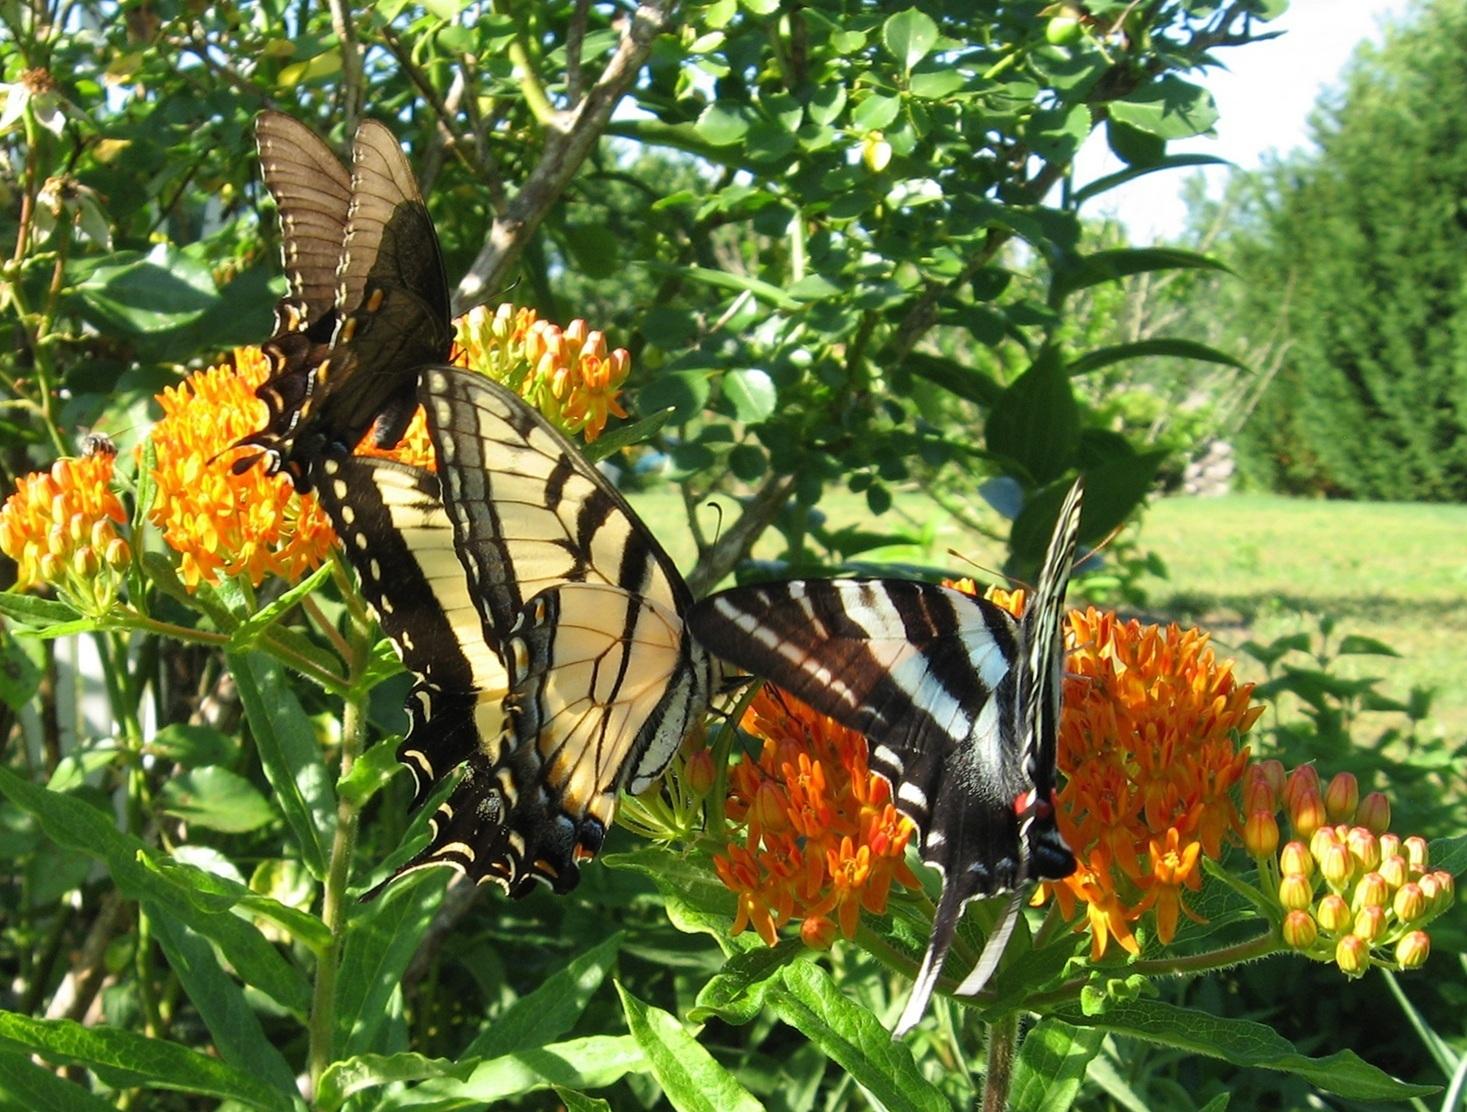 butterfly_wd_3_btrflies_6_3_11_wbg_byjan.jpg